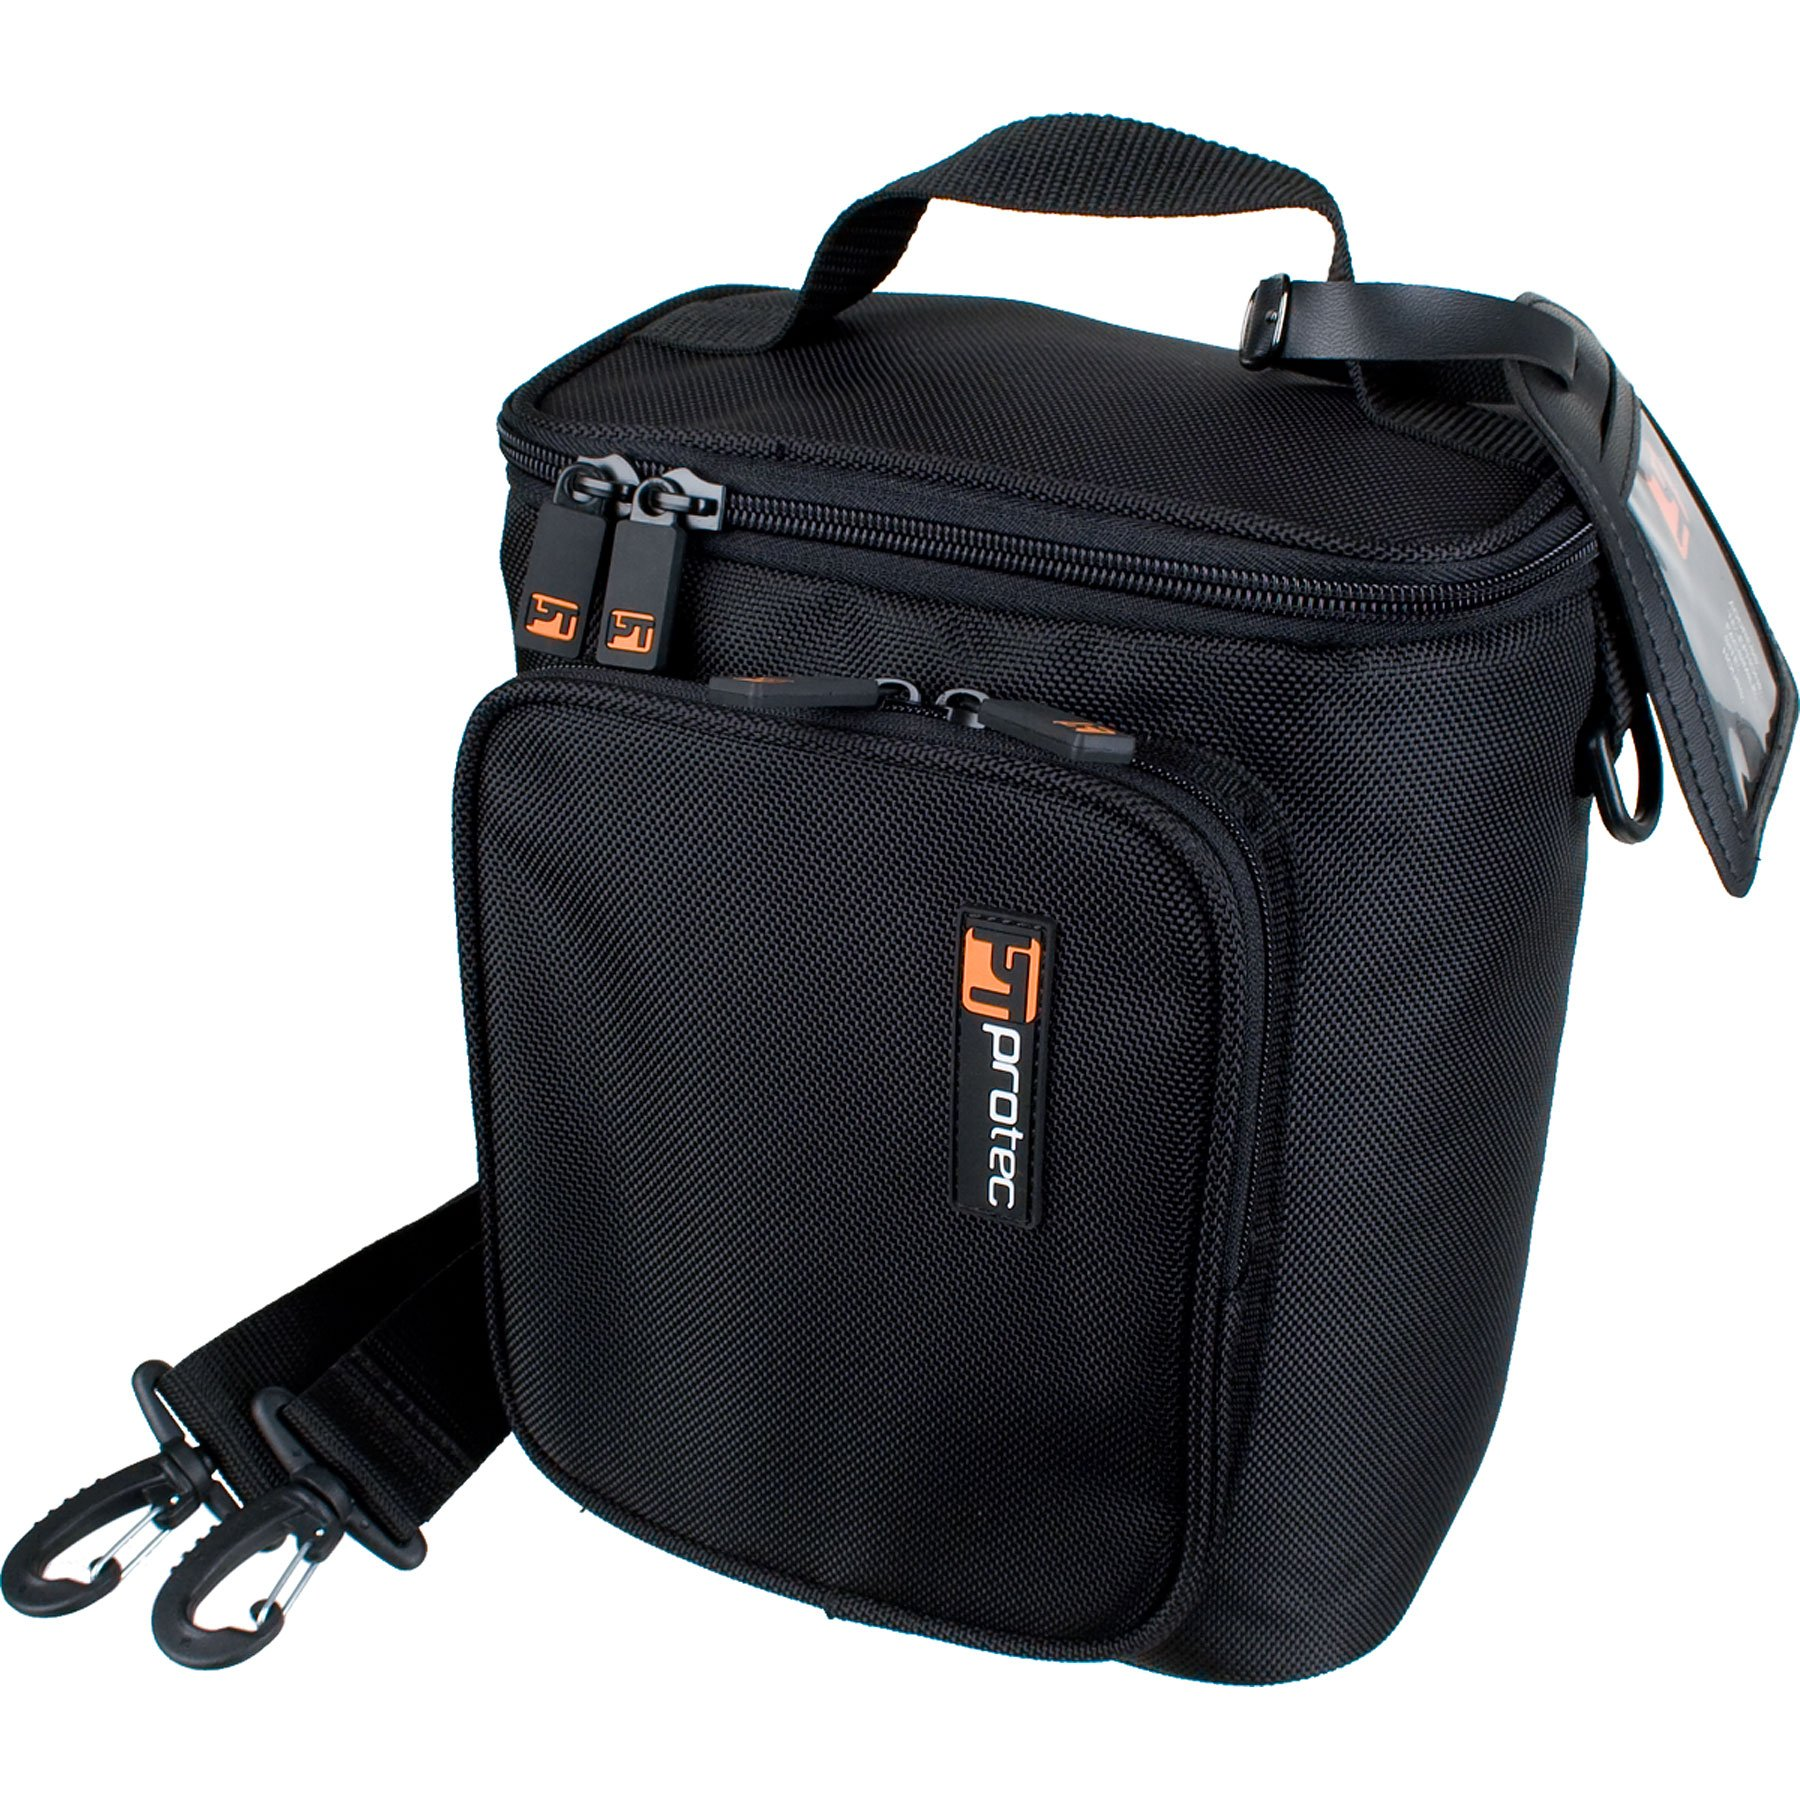 Protec Trumpet Mute Bag with Modular Divider, Model M400